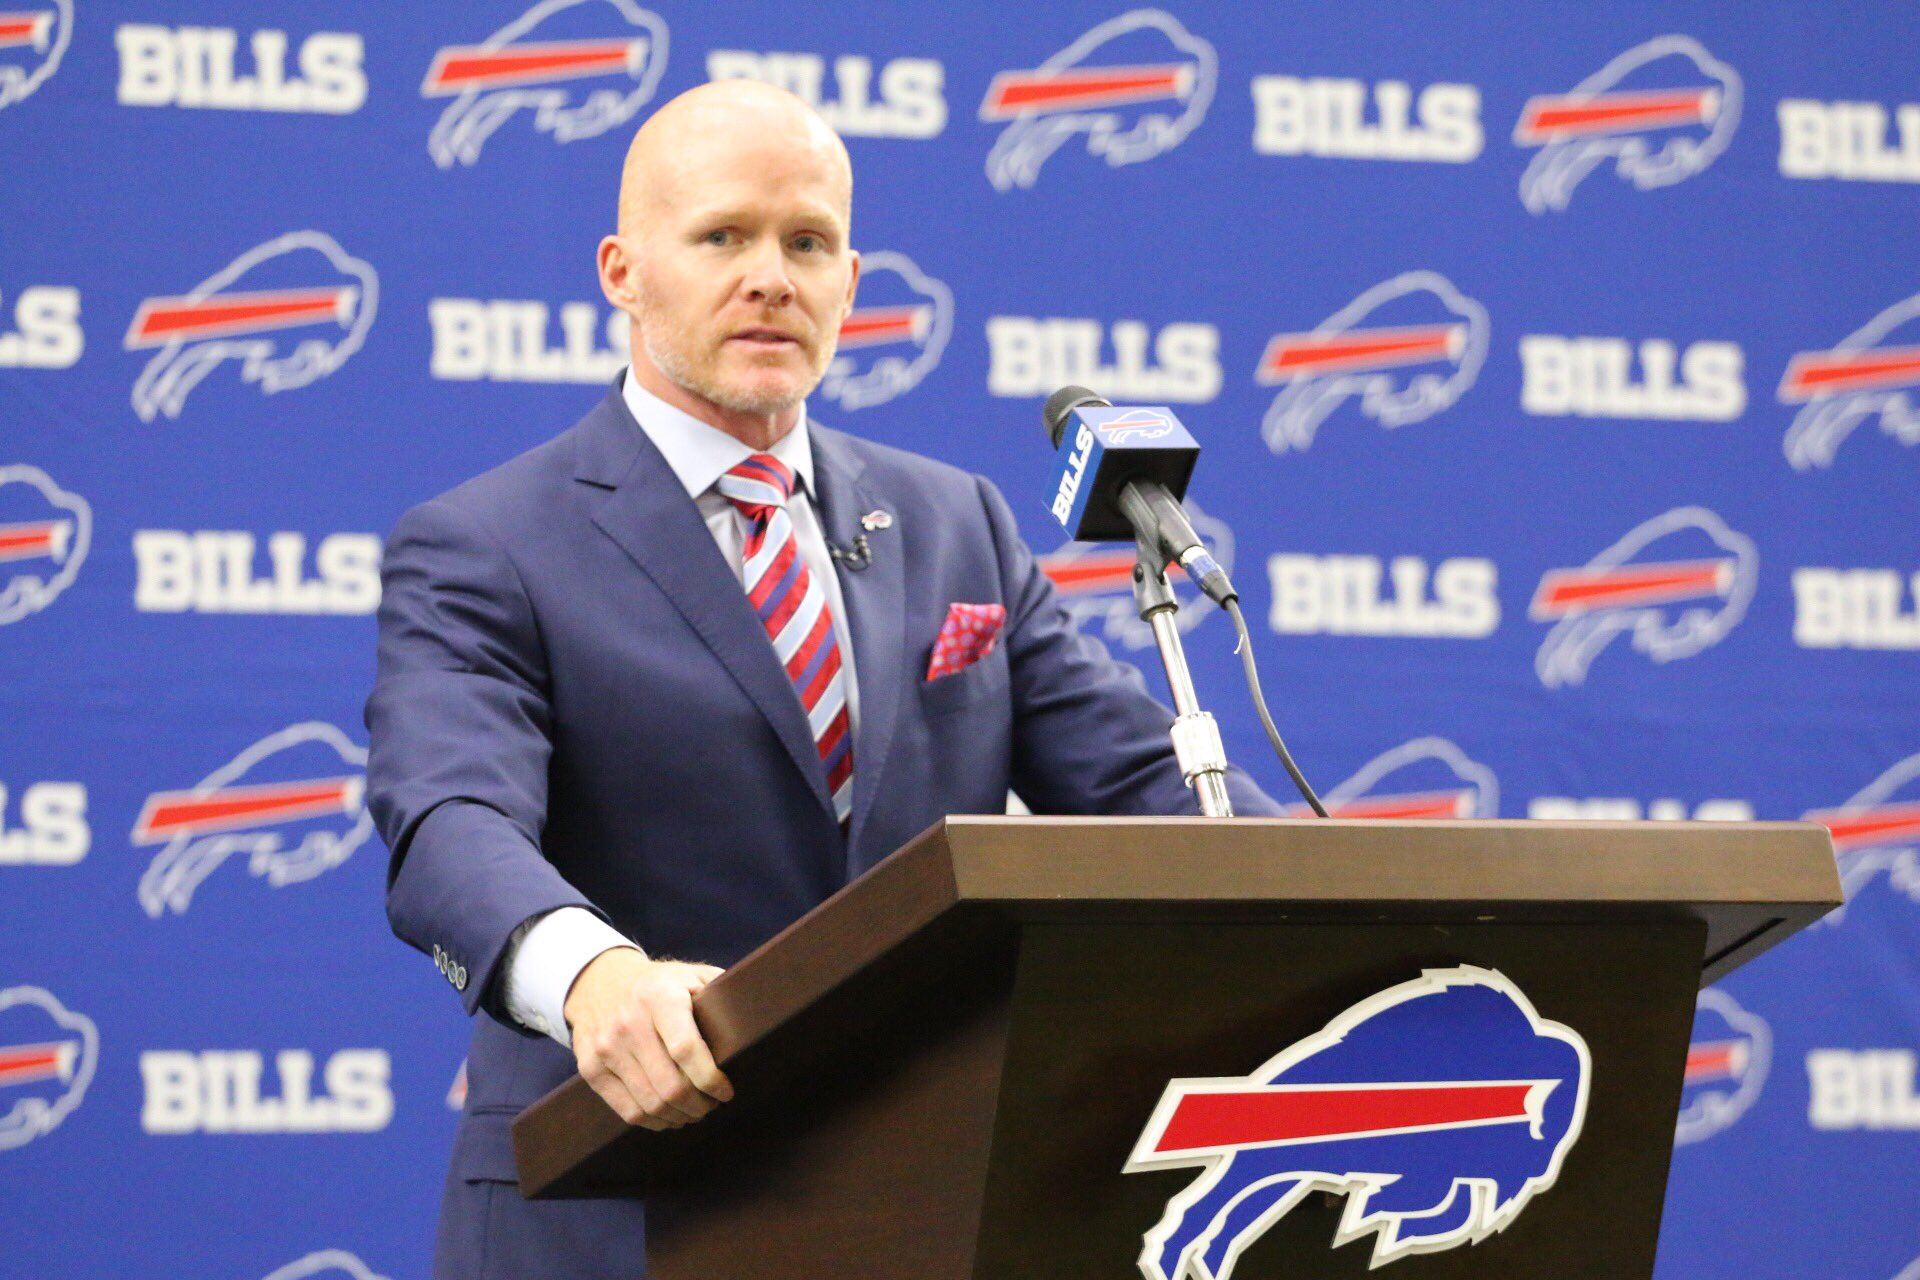 Head Coach Sean McDermott sure looks good in Bills colors. (photo via buffalobills.com)